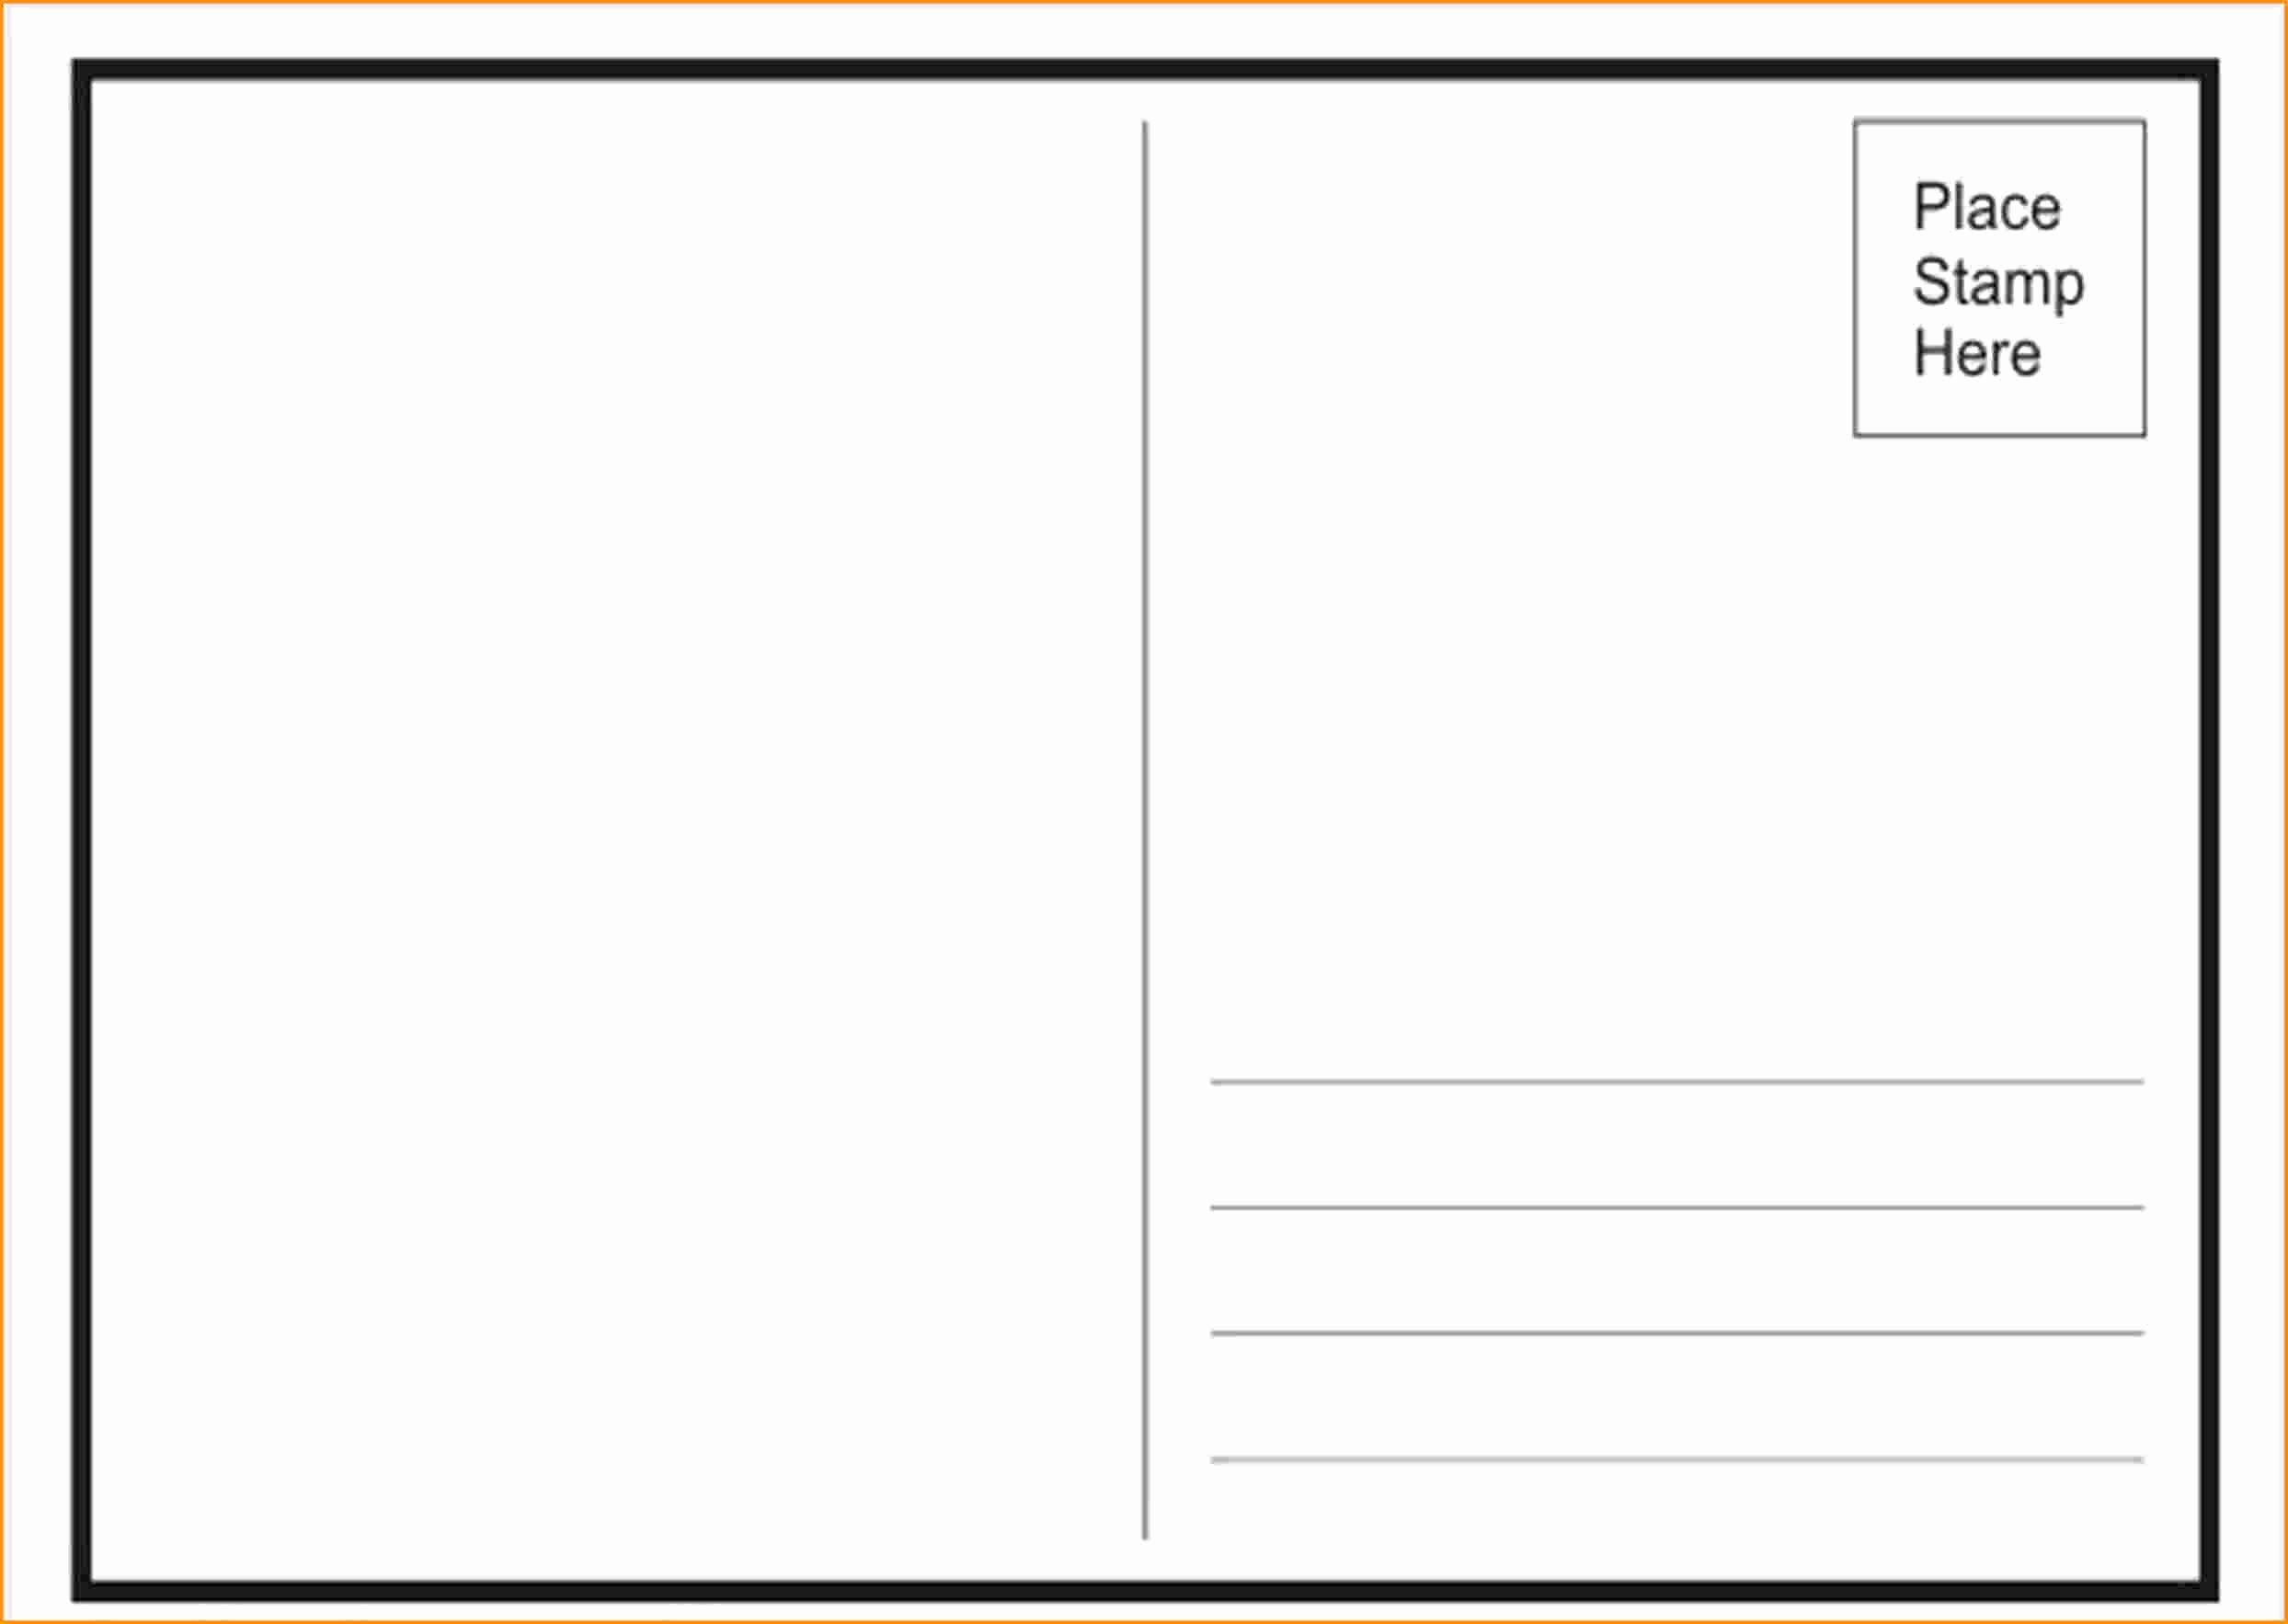 Free Printable Postcard Template Lovely Free Postcard Templates for Word Portablegasgrillweber